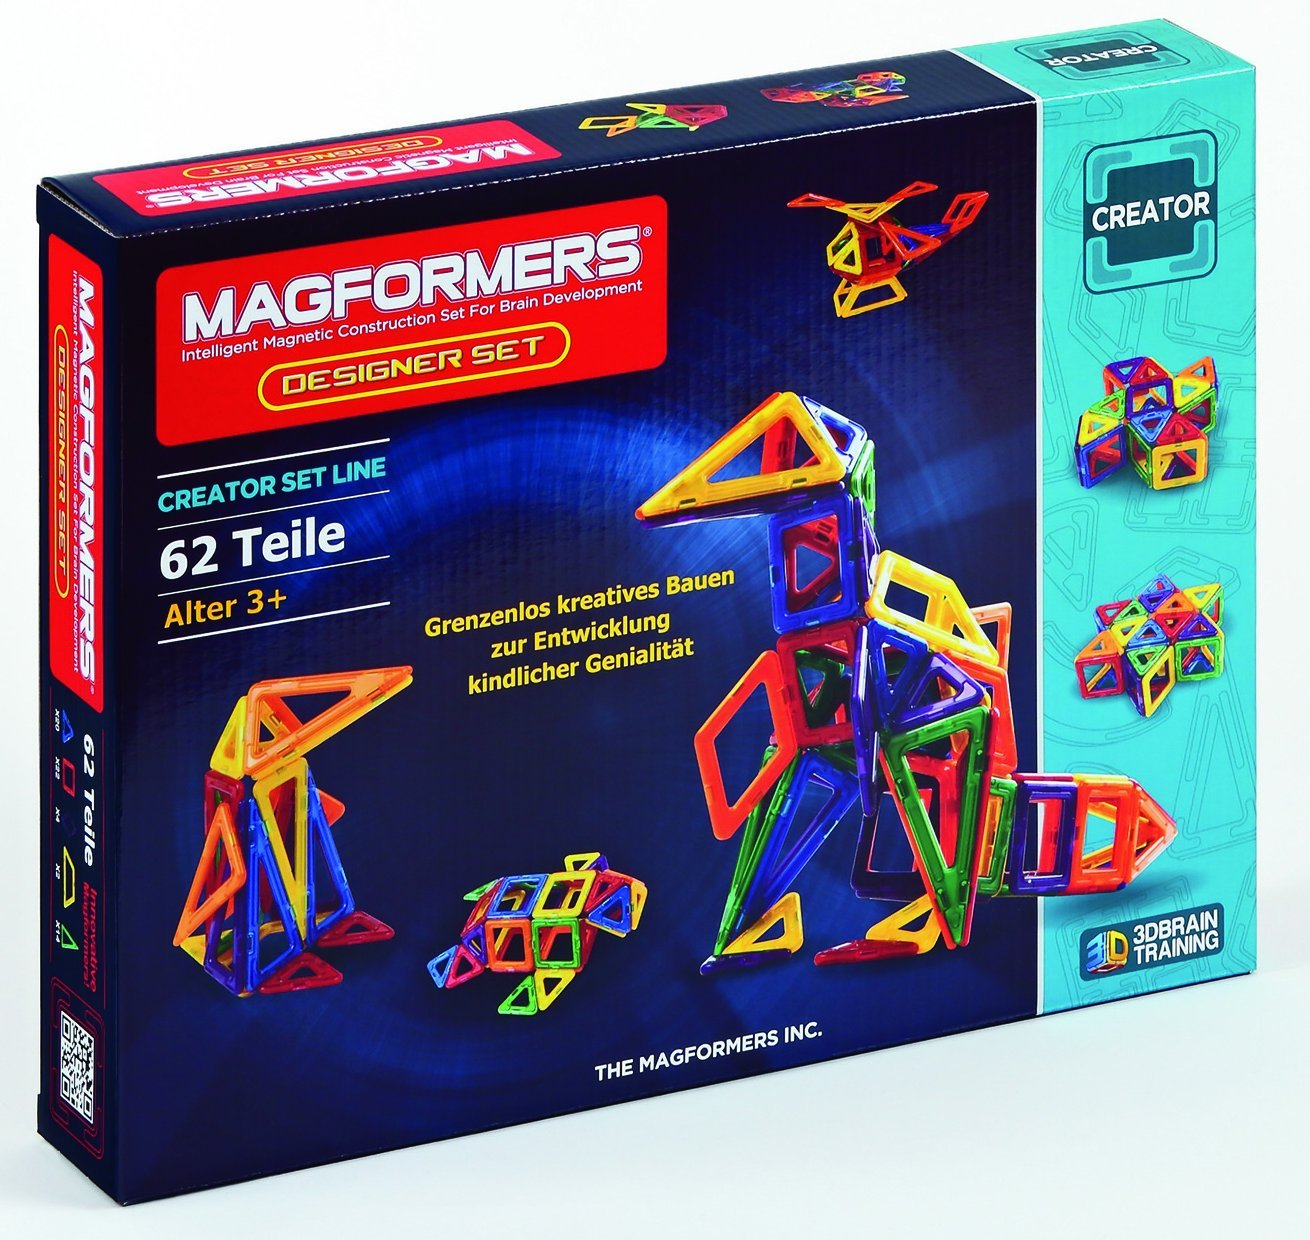 Magformers Günstige Alternative